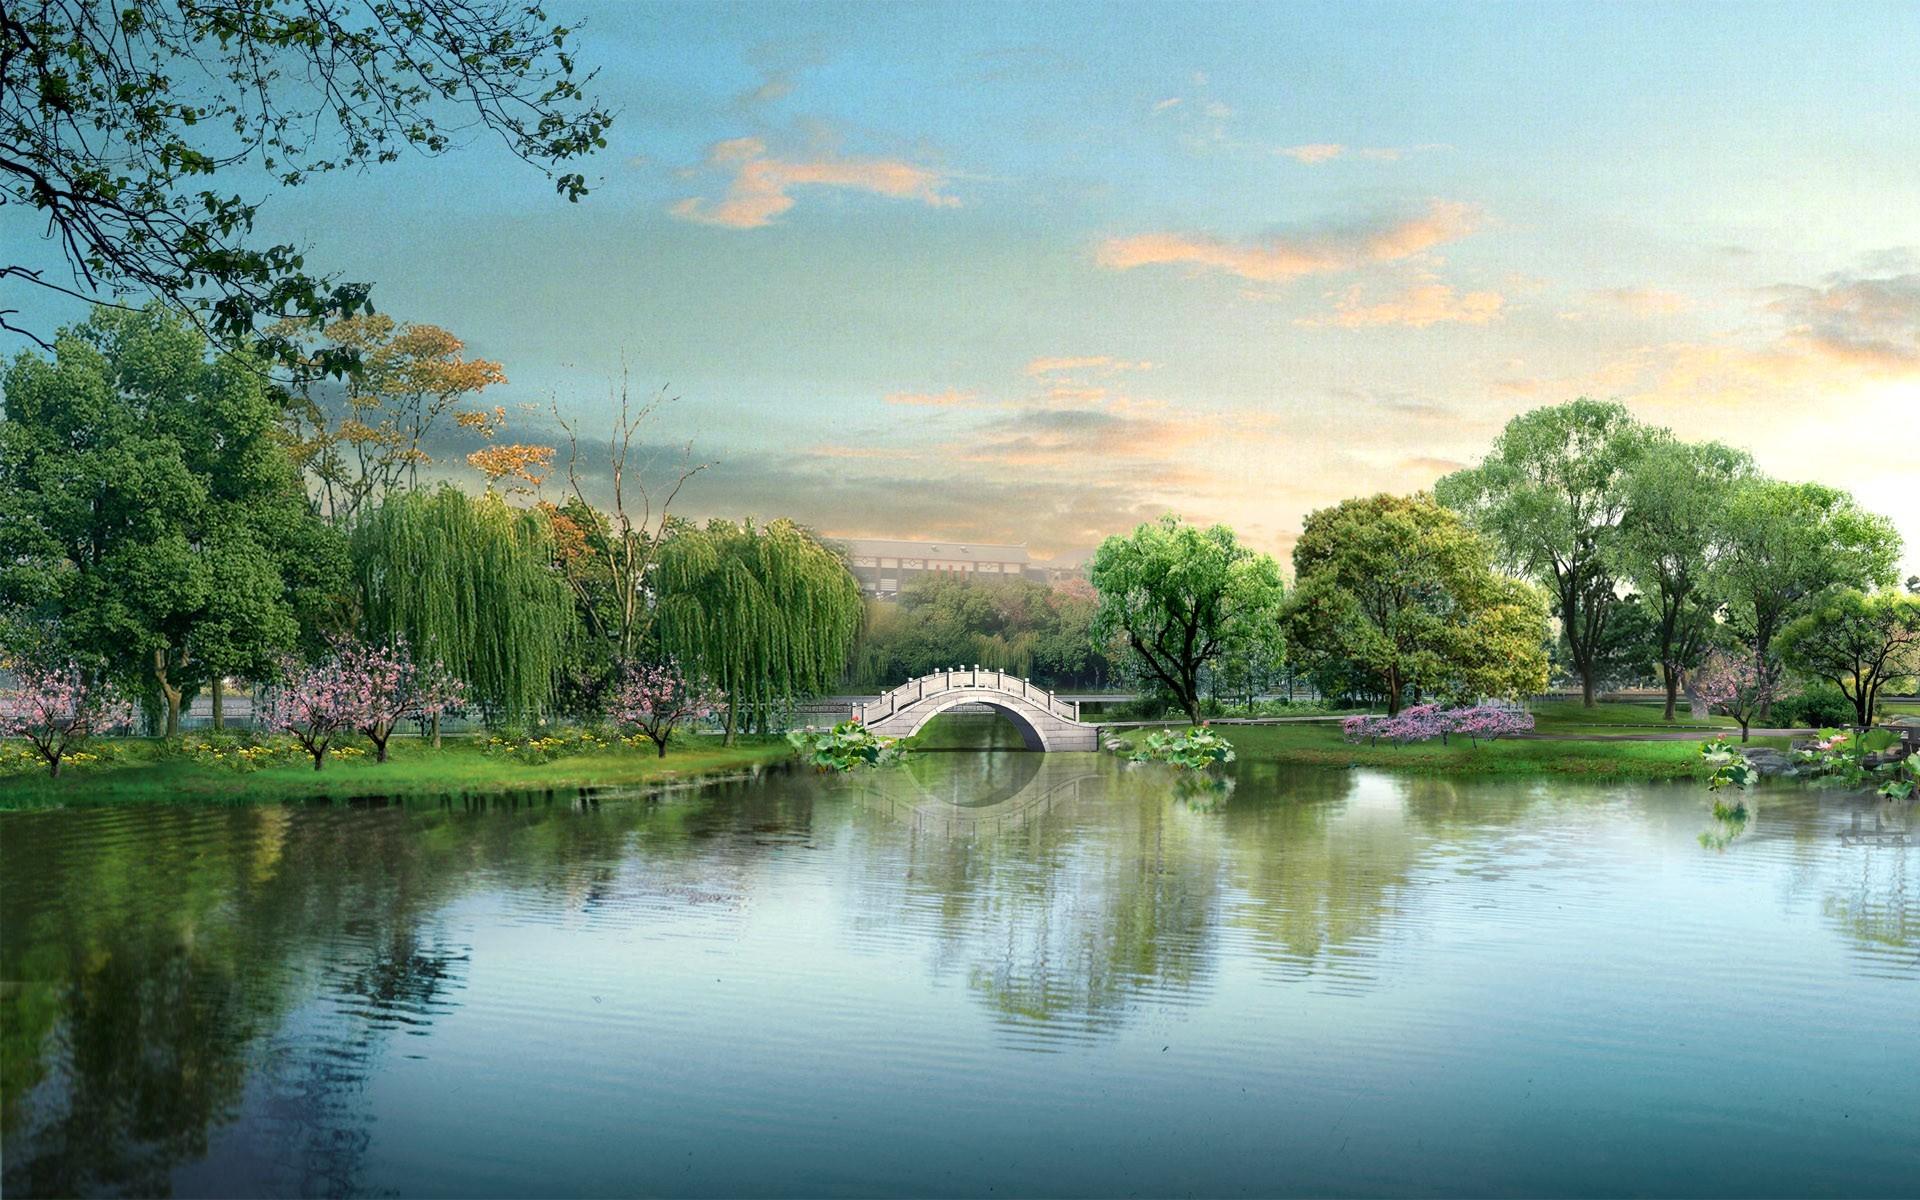 beautiful landscape photos | beautiful nature landscapes wallpapers hd  widescreen desktop wallpaper .